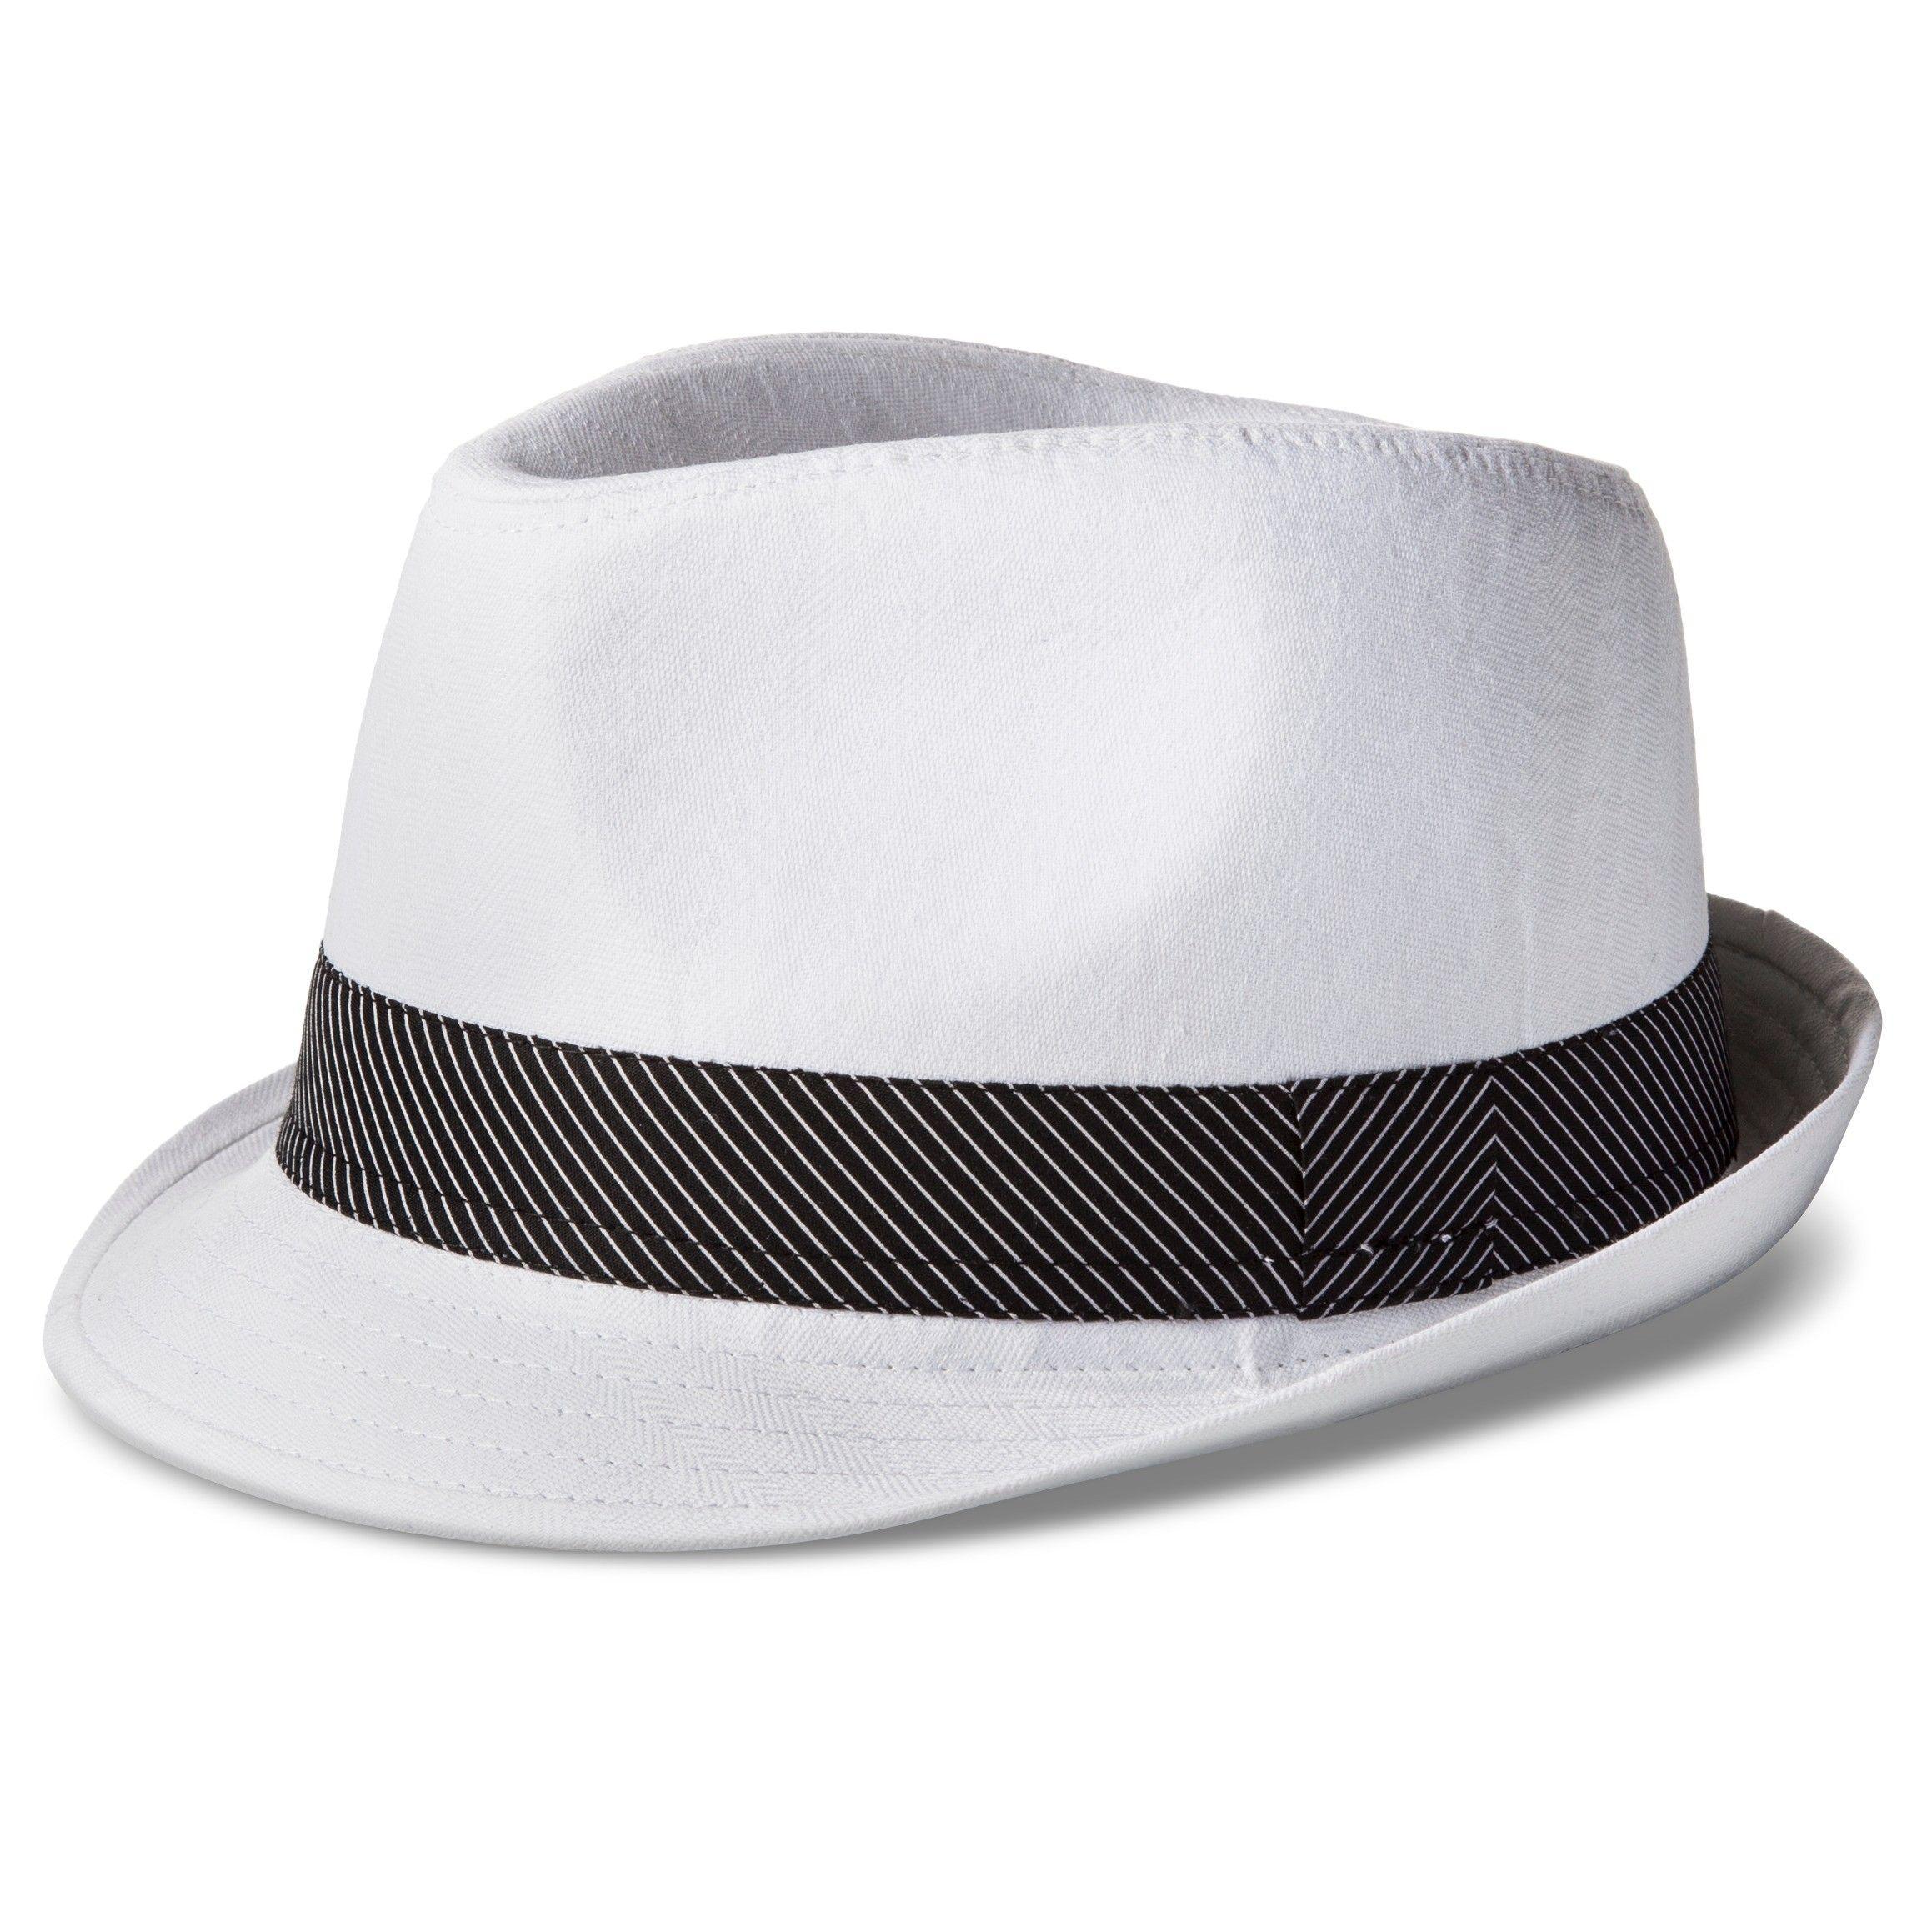 a4666a7495f191 Men's Herringbone Fedora - White/Black | Target Men's Hats | Hats ...